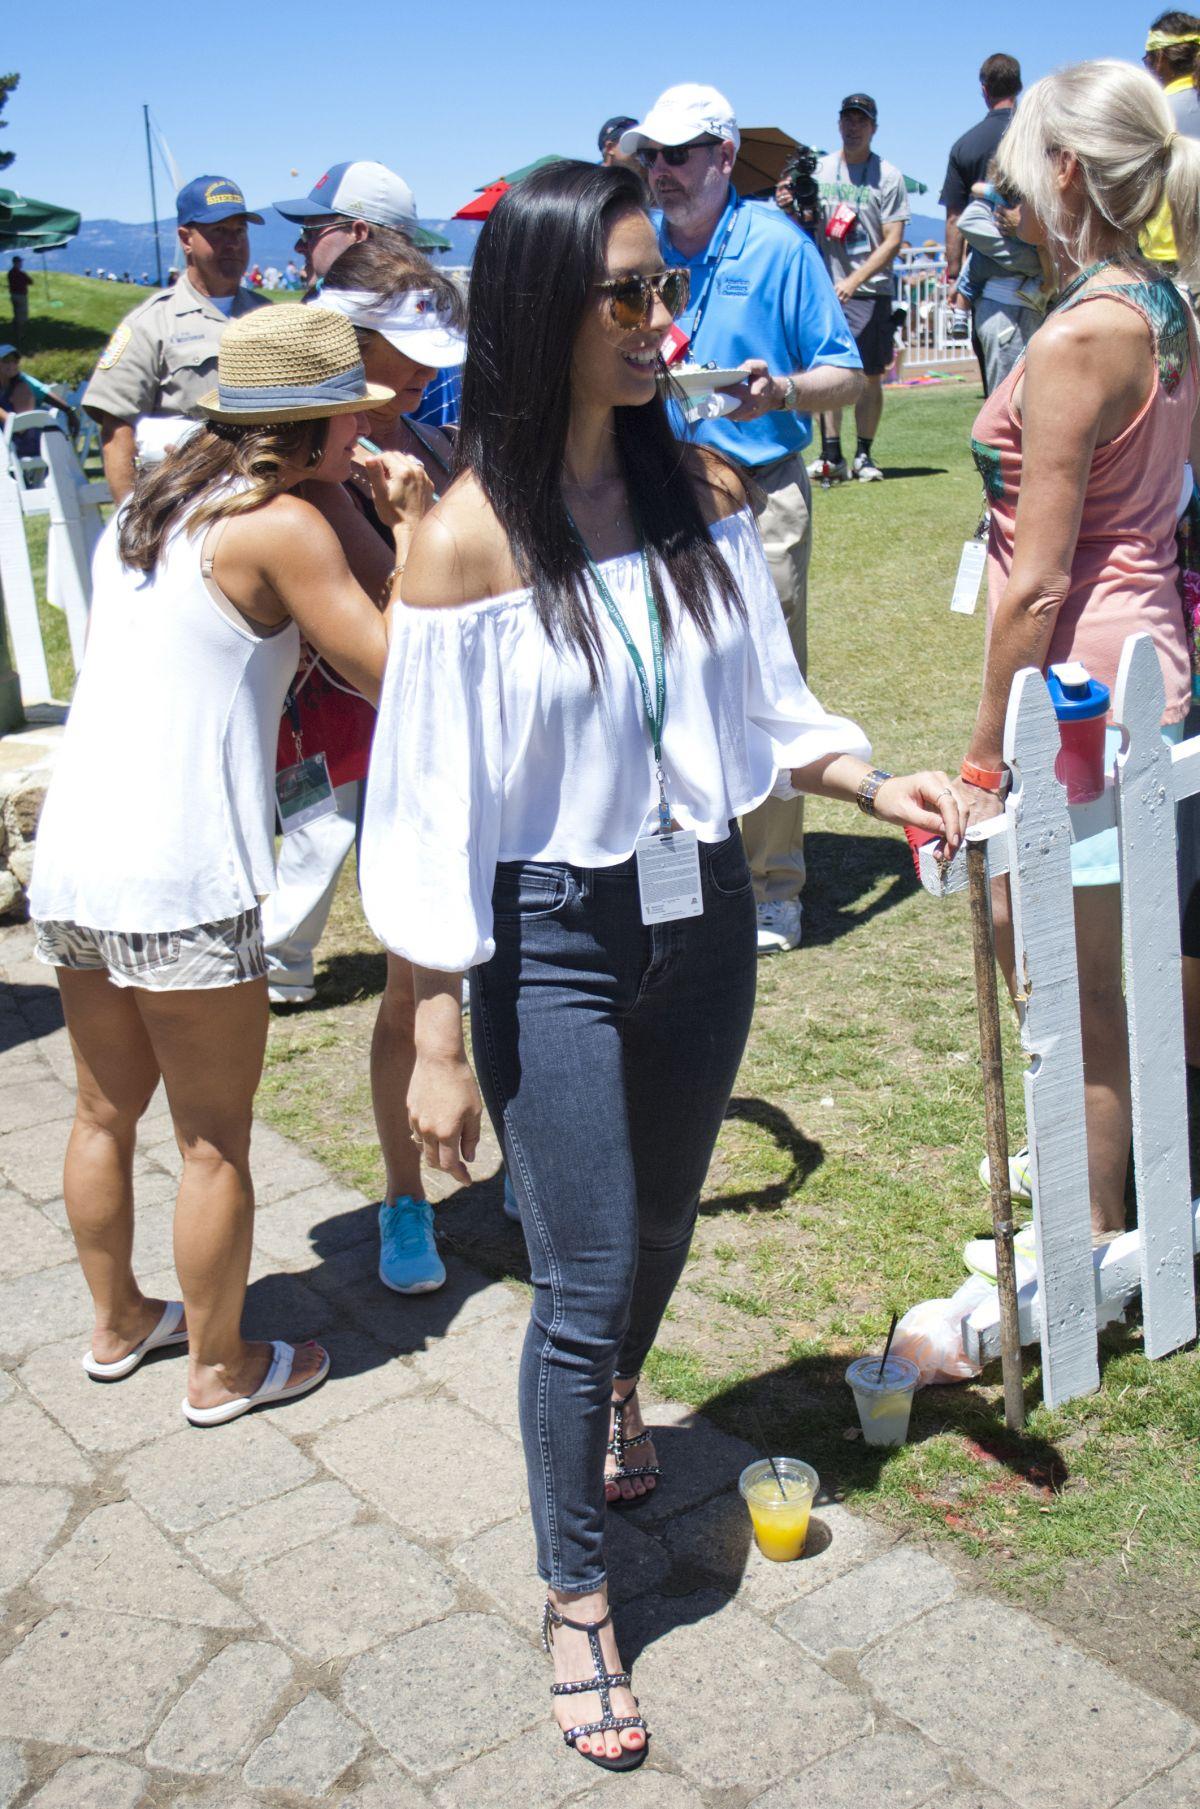 CelebPhotos: Olivia Munn - Unknown golf event Showing her